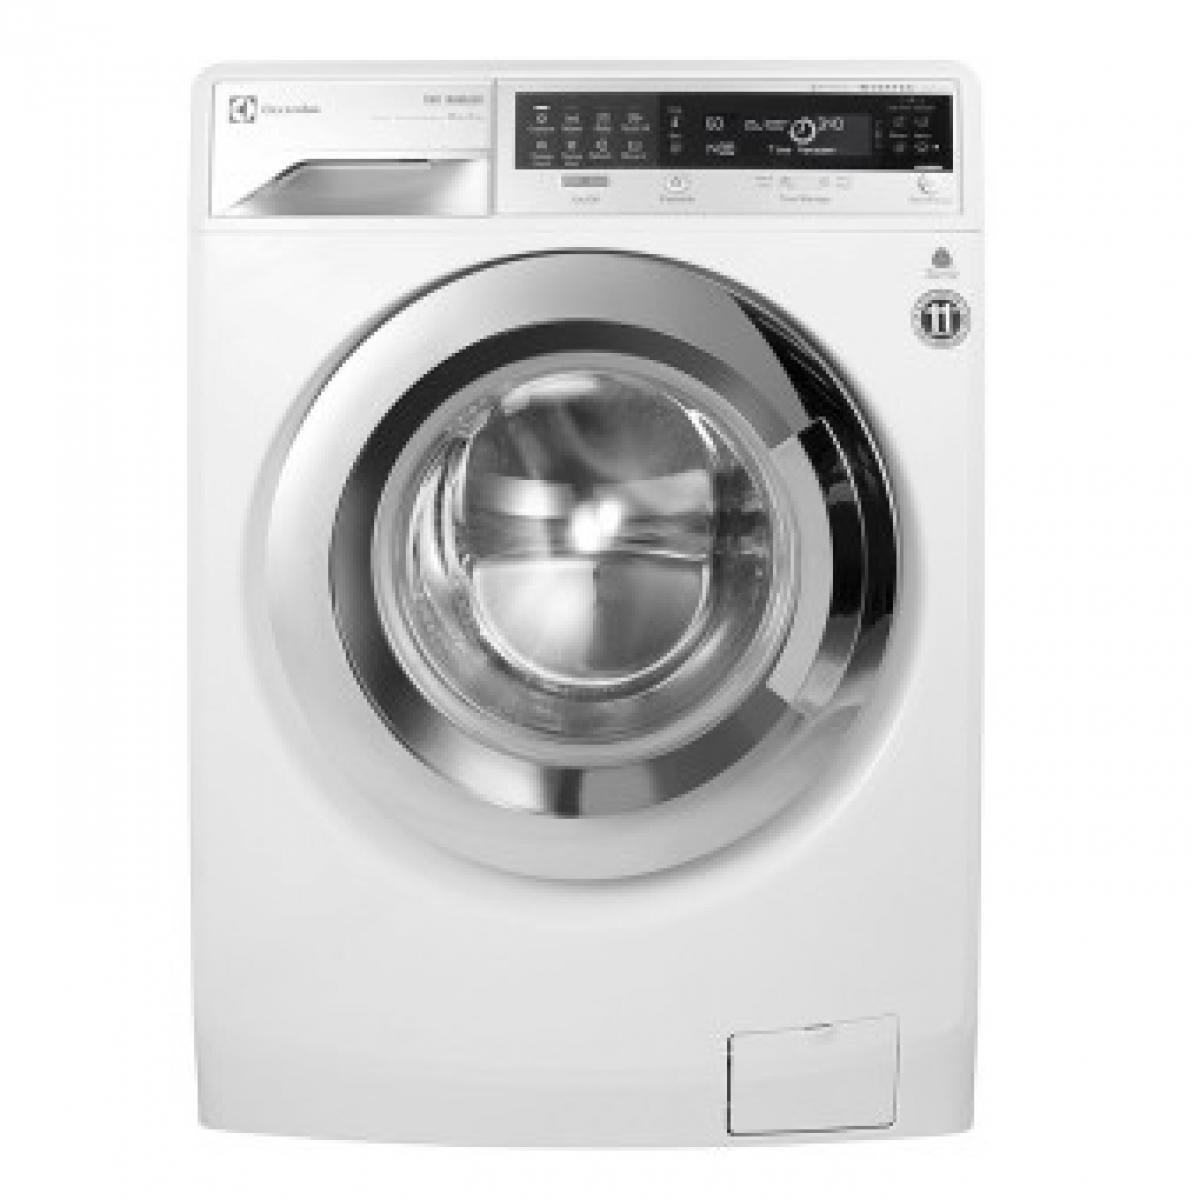 Washer Dryer Electrolux 10 Kg Eww14012